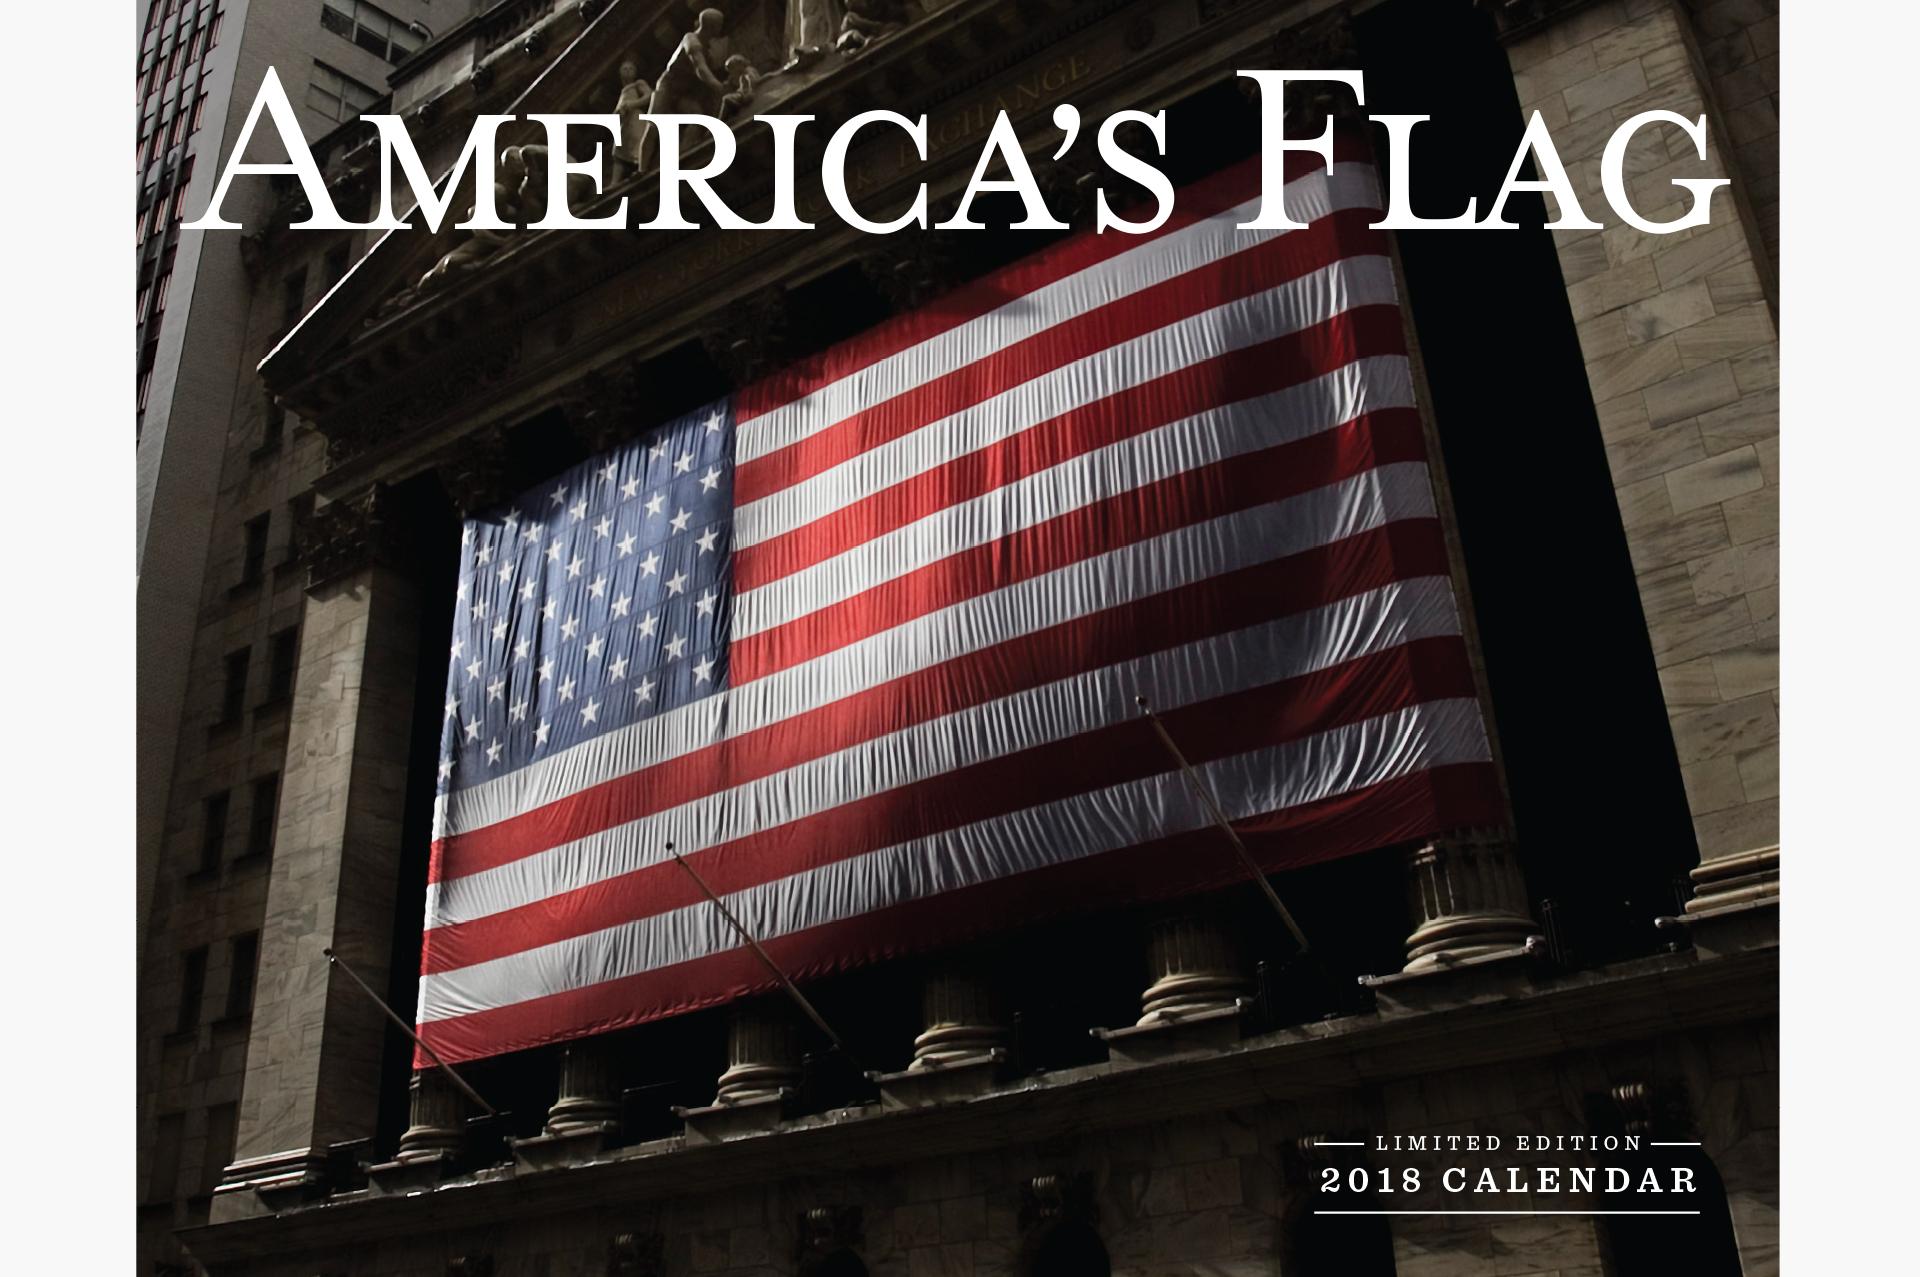 2018 American Flag Calendar